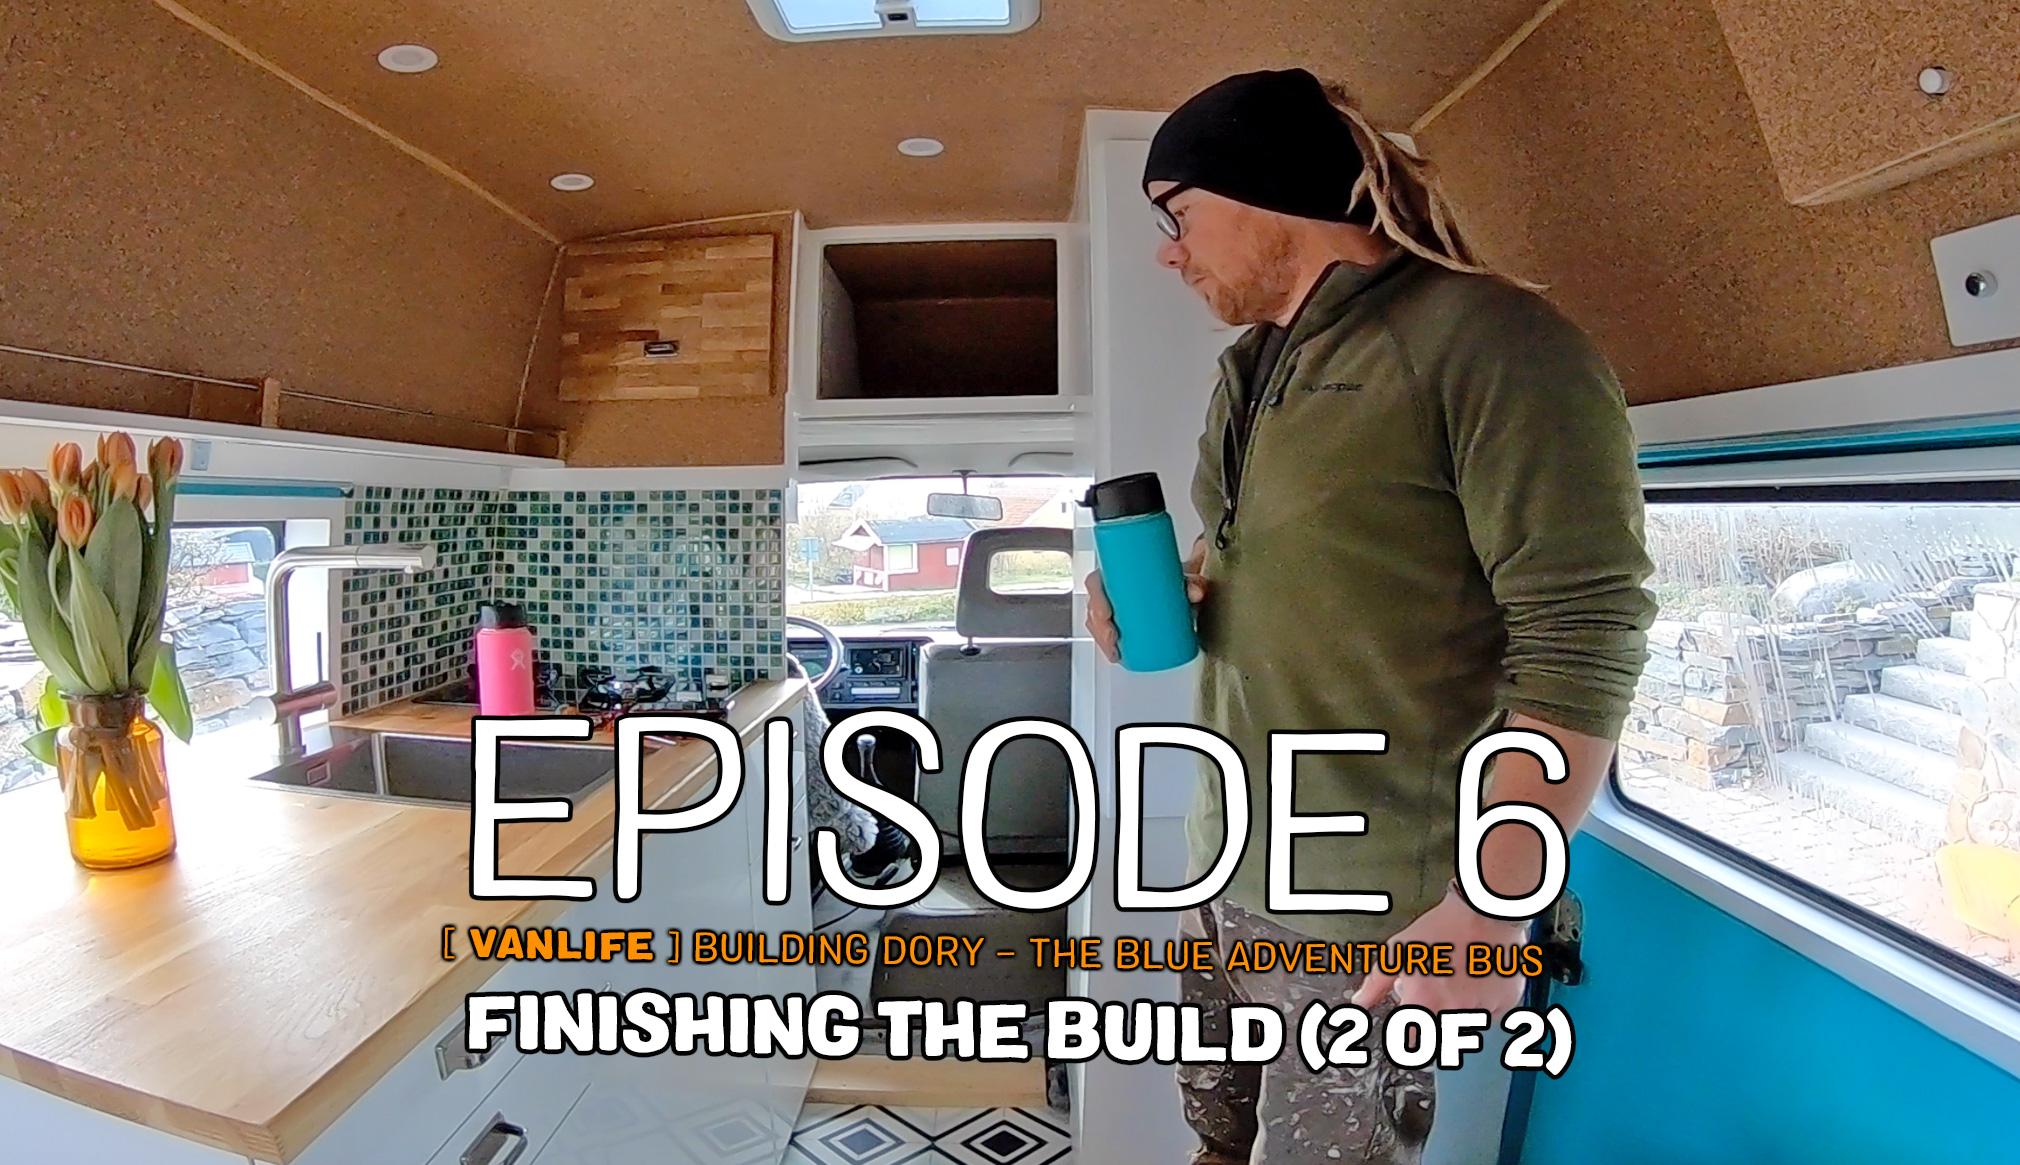 Building Dory episode 6